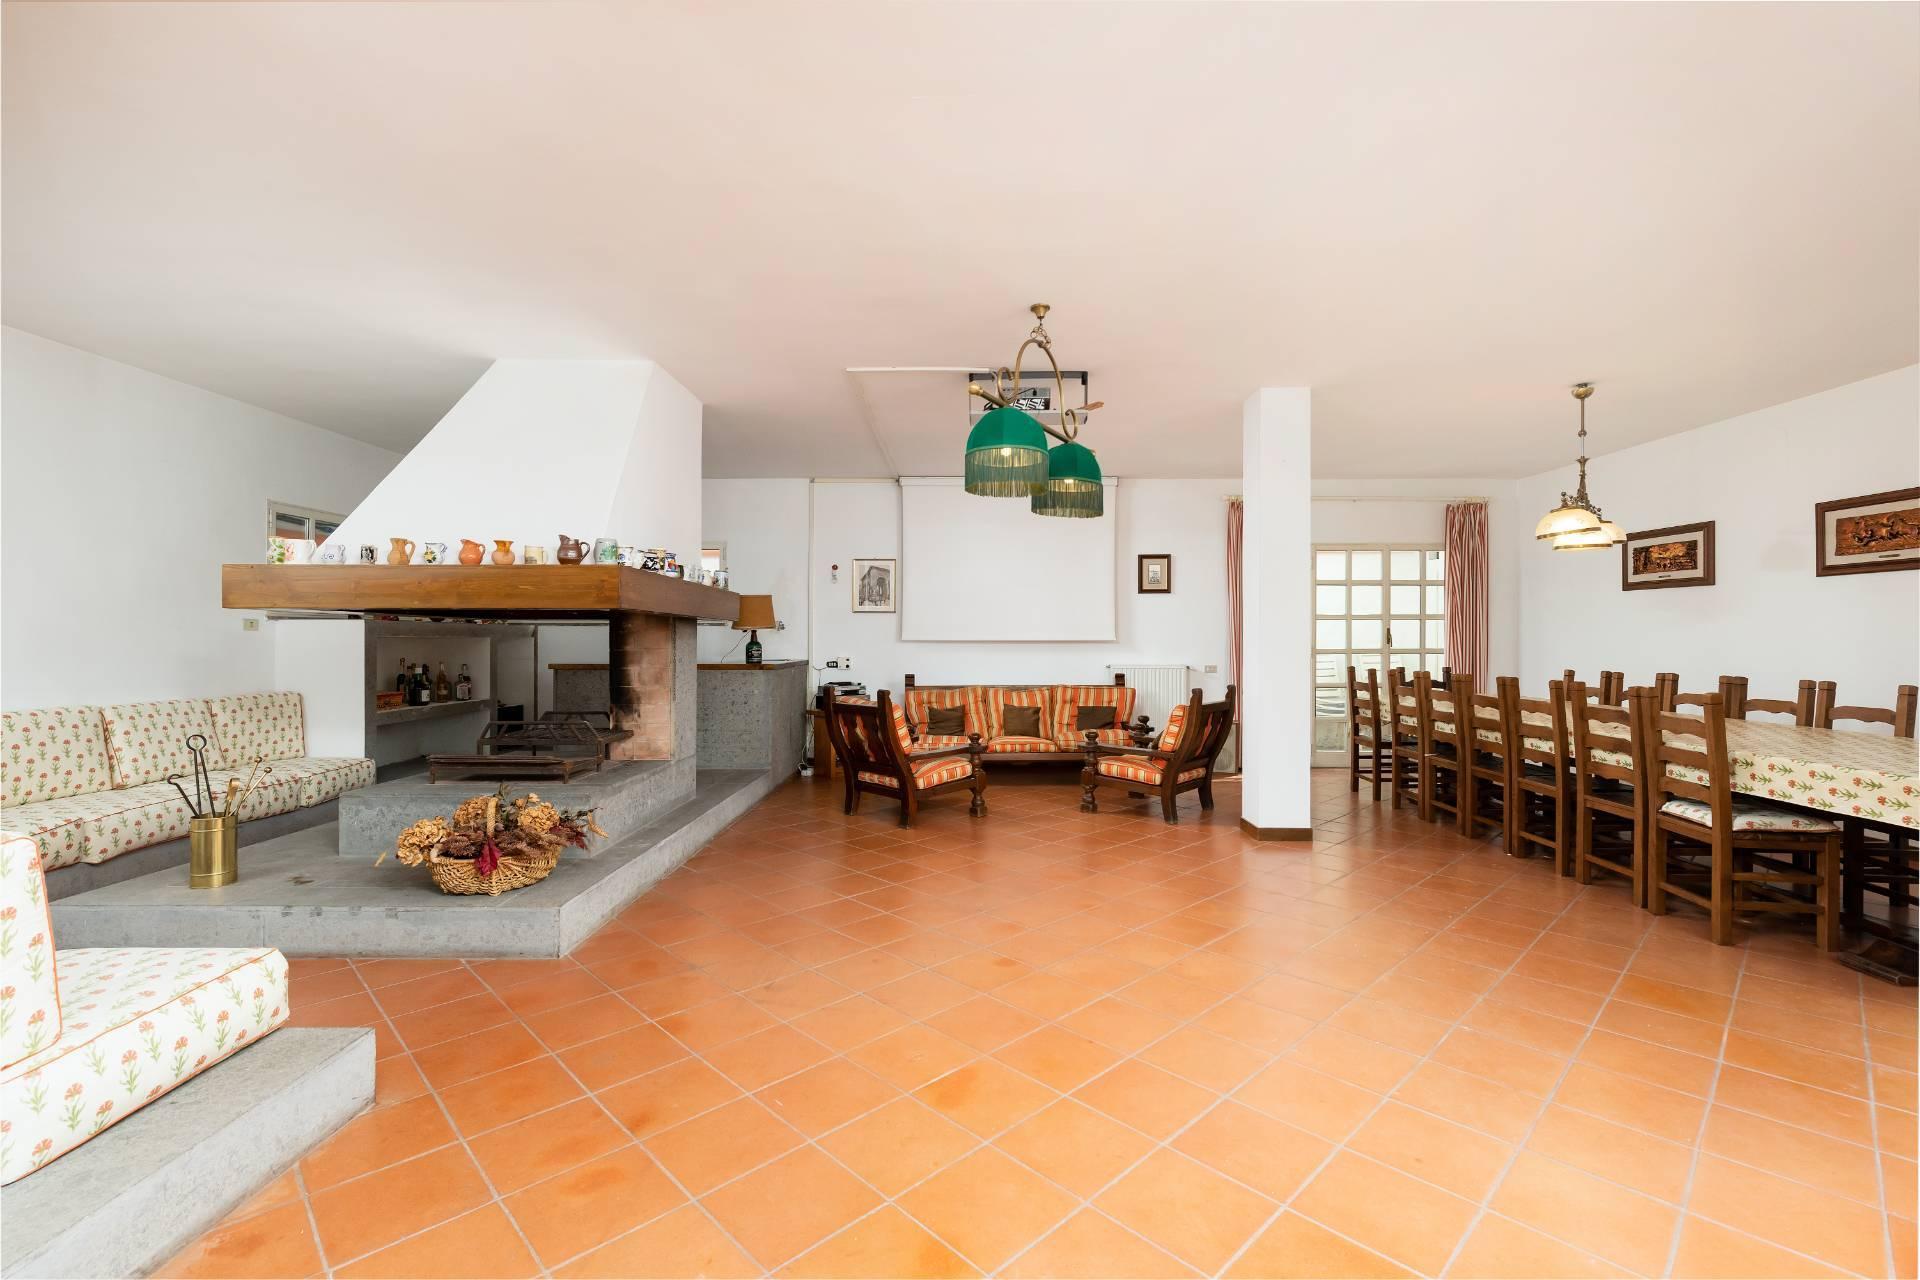 Villa in Vendita a Ariccia: 5 locali, 583 mq - Foto 7